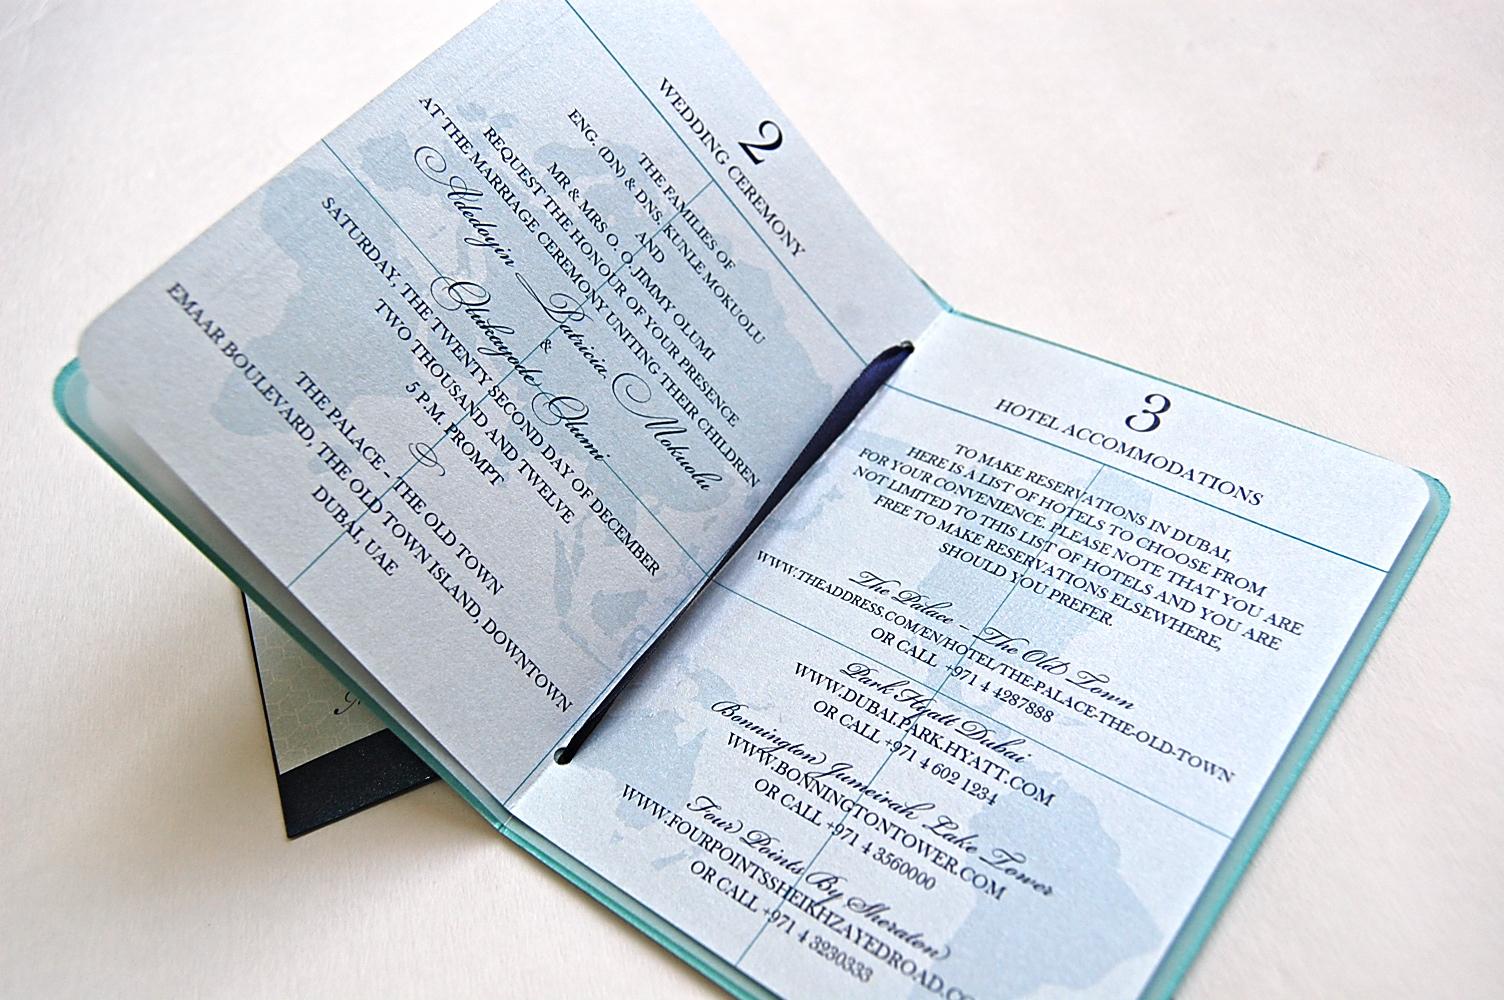 Stella dimoko korkuscom no passport booklet in nigeria for Wedding invitation printing in dubai